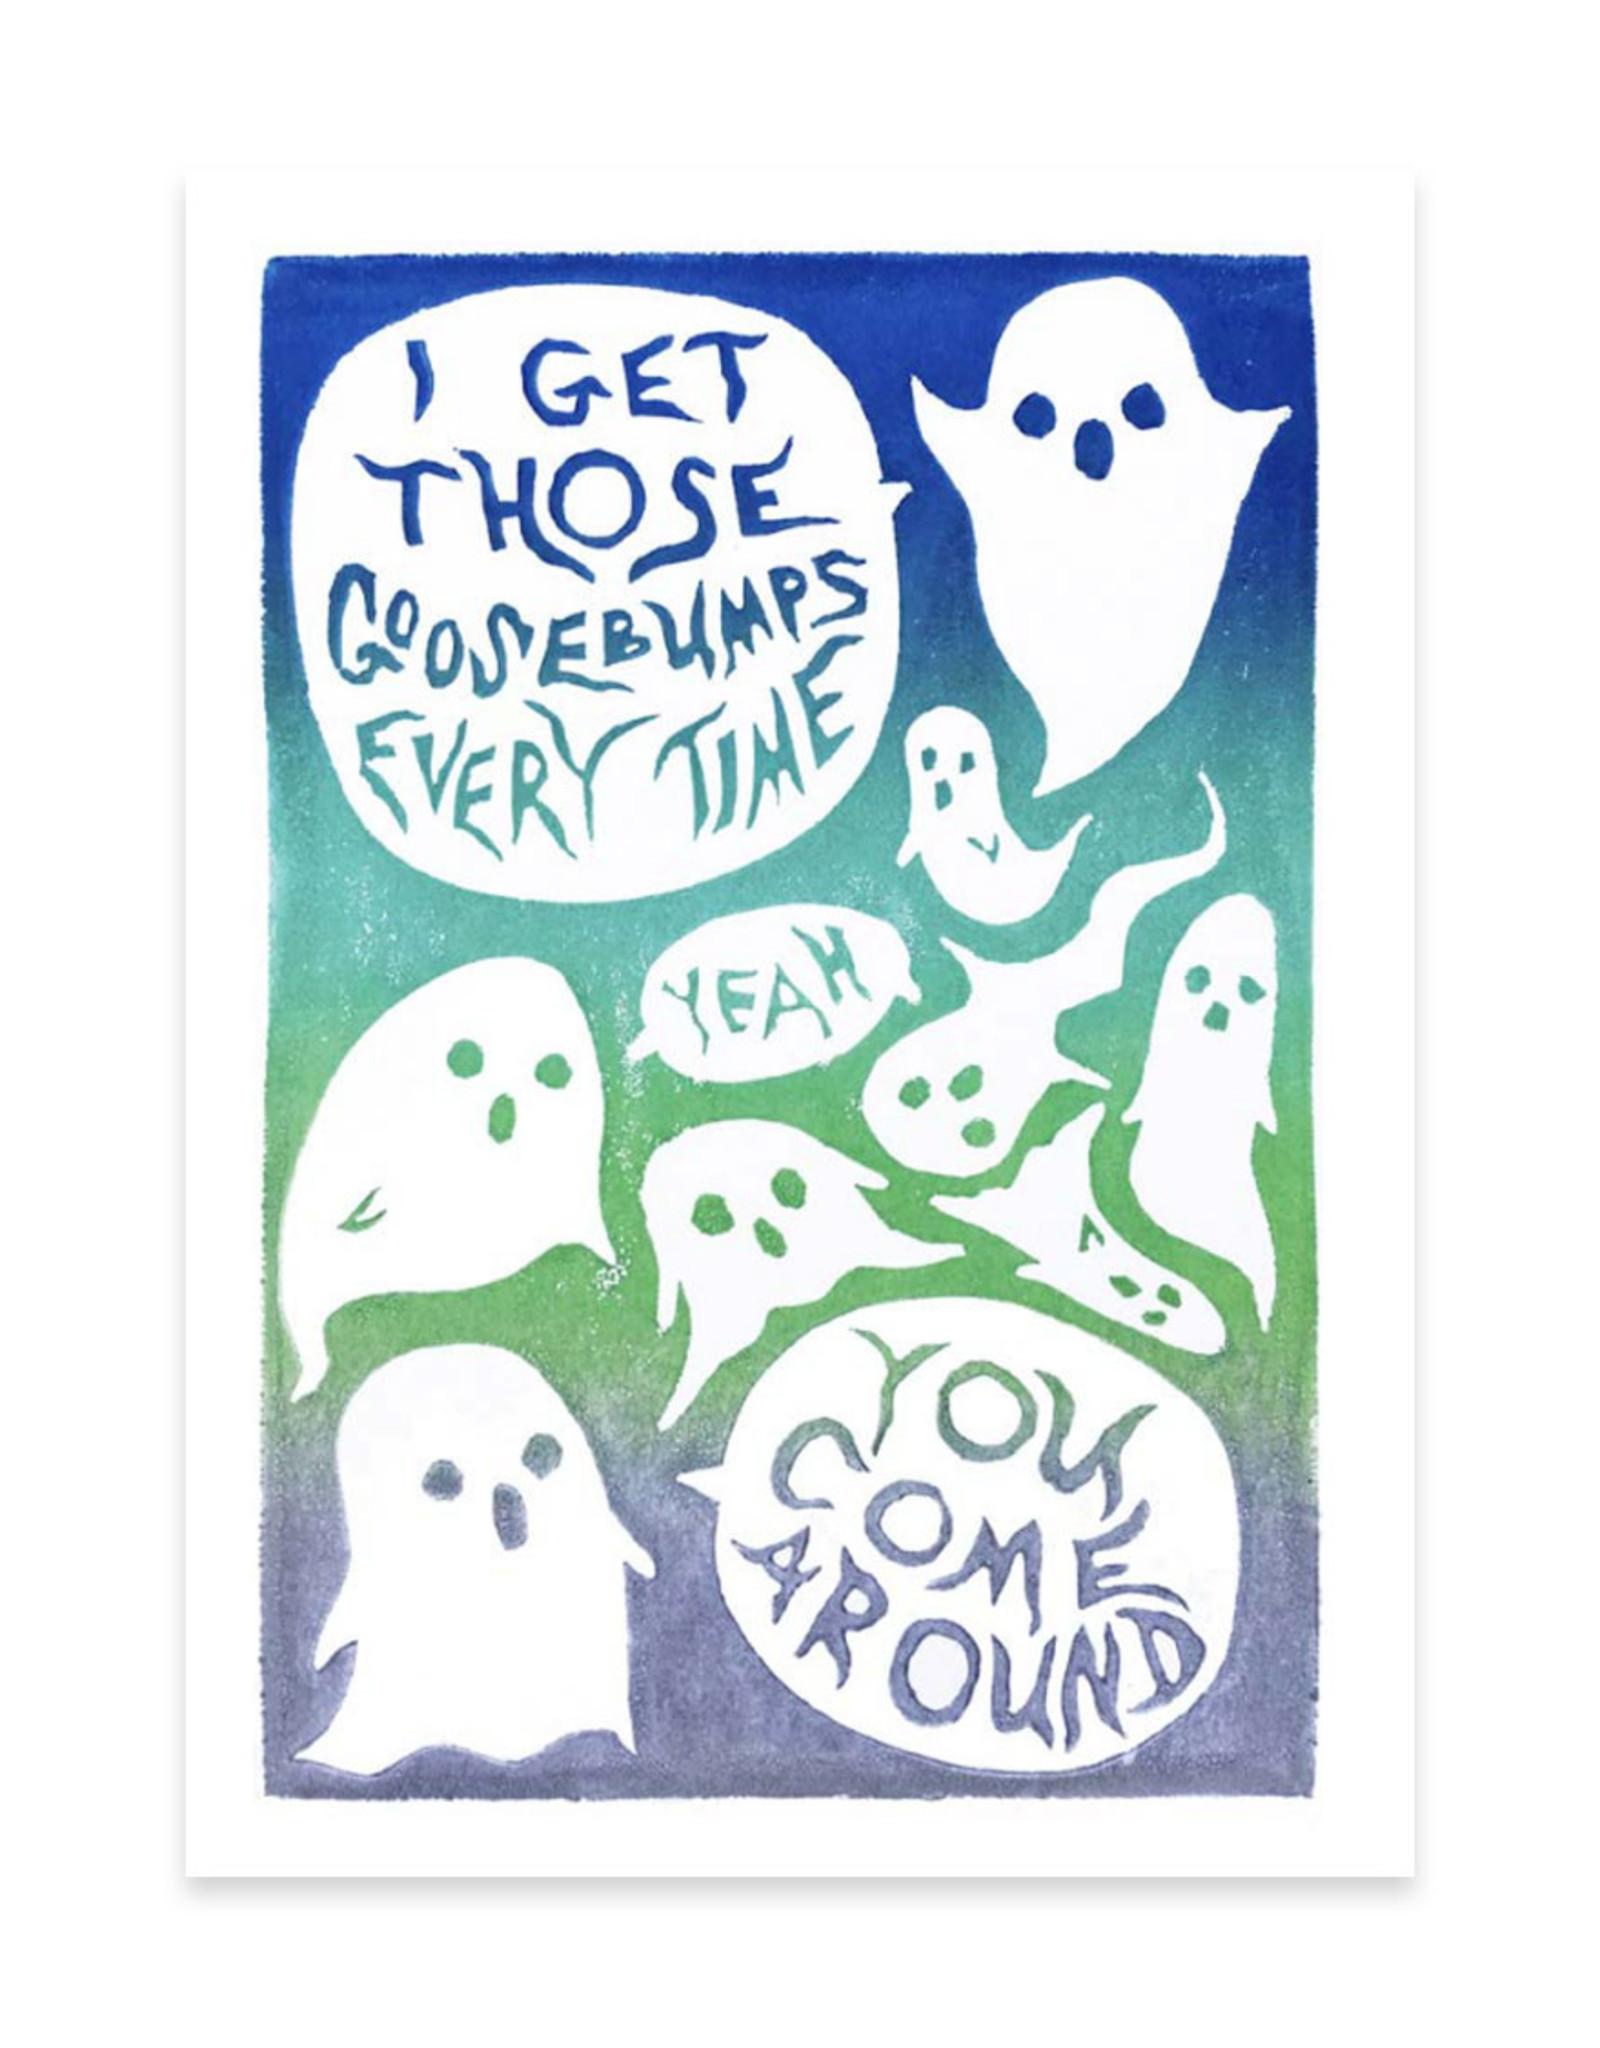 Goosebumps Everytime Greeting Card